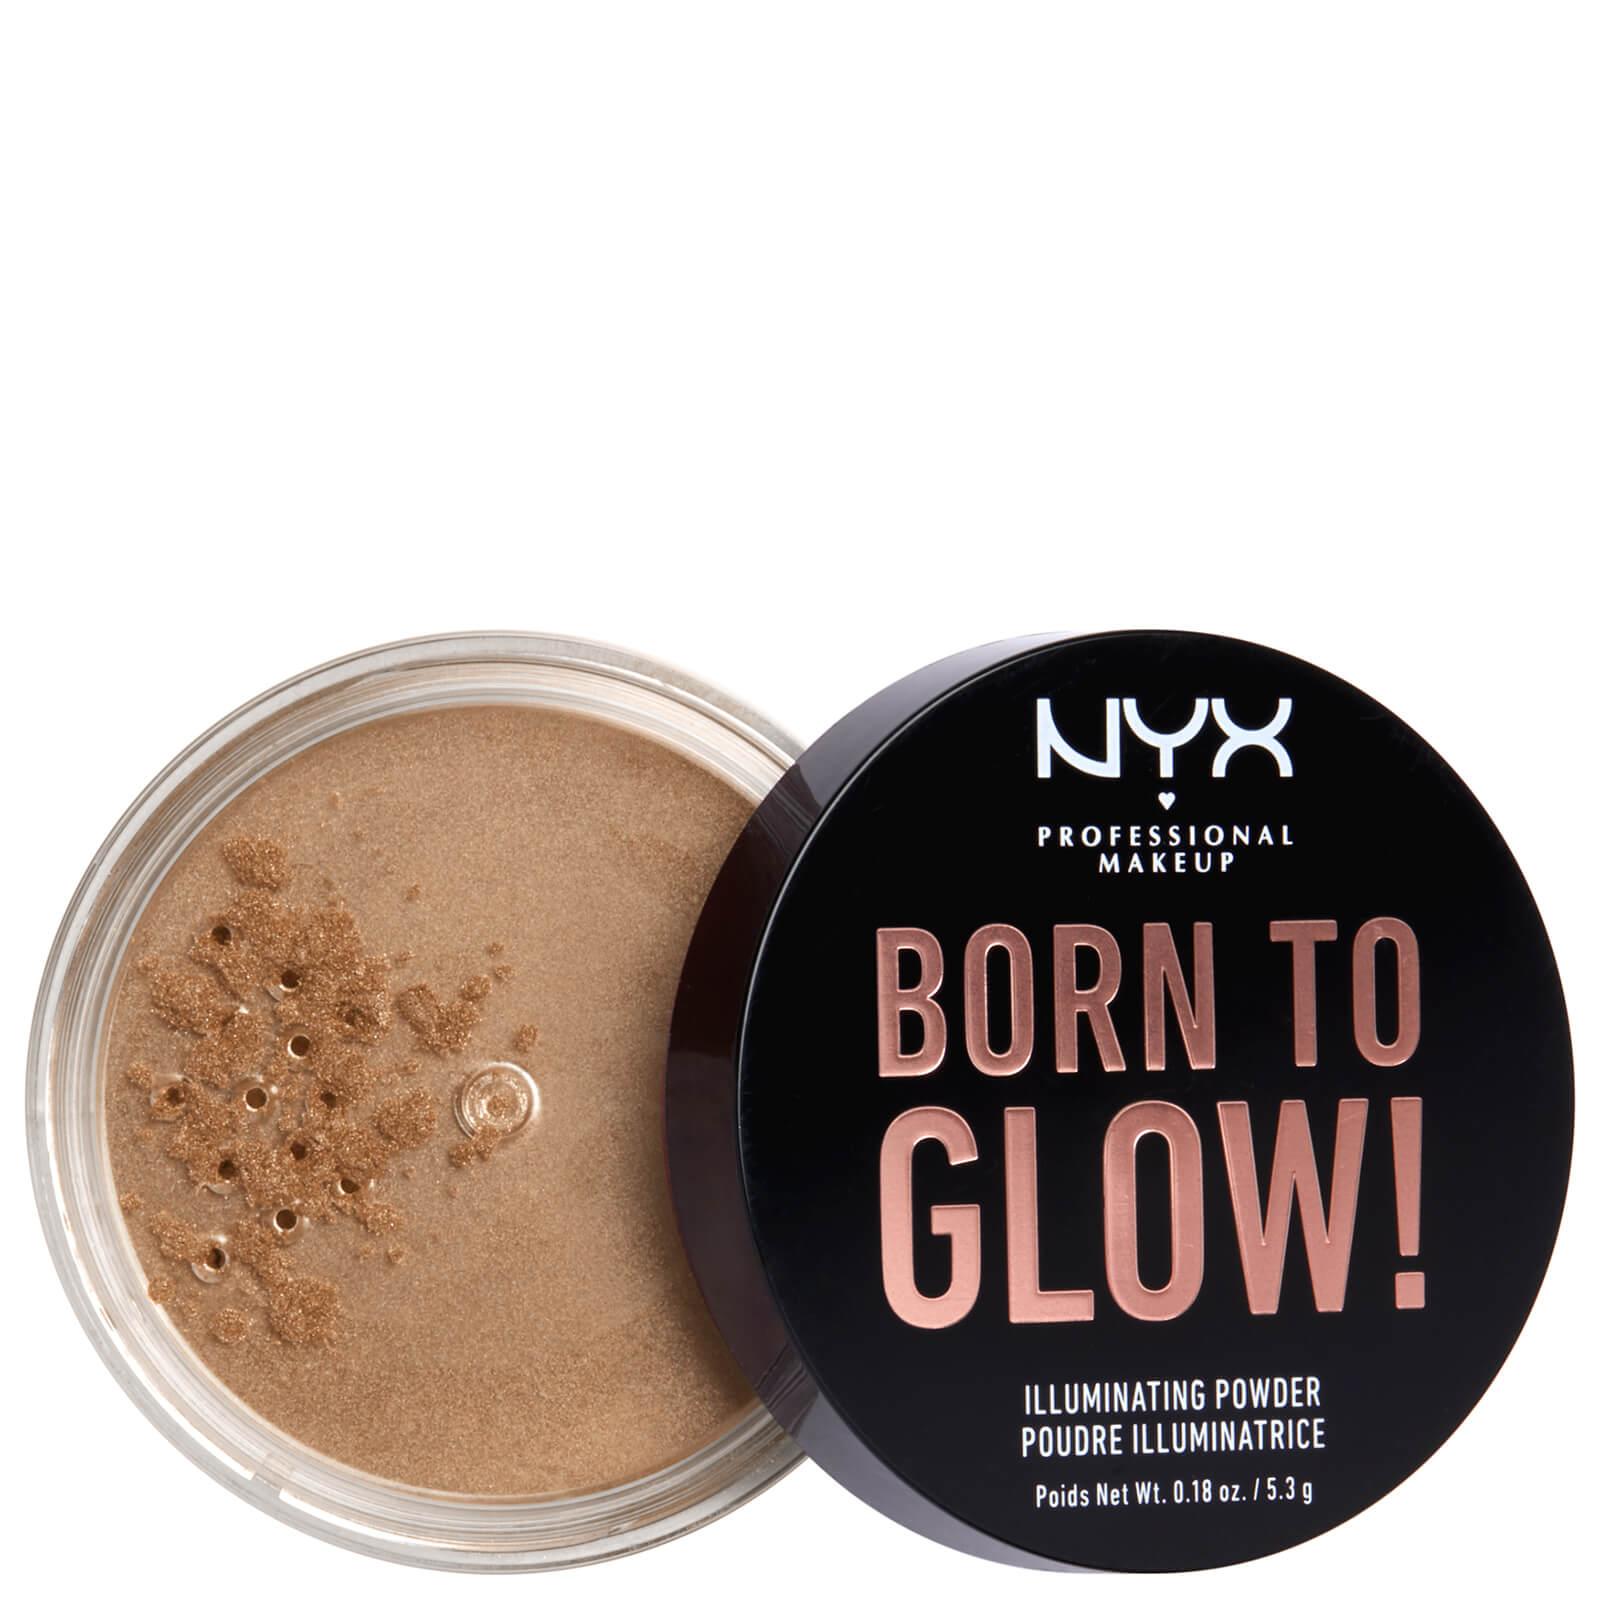 NYX Professional Makeup Born to Glow Illuminating Powder 5.3g (Various Shades) - Warm Strobe